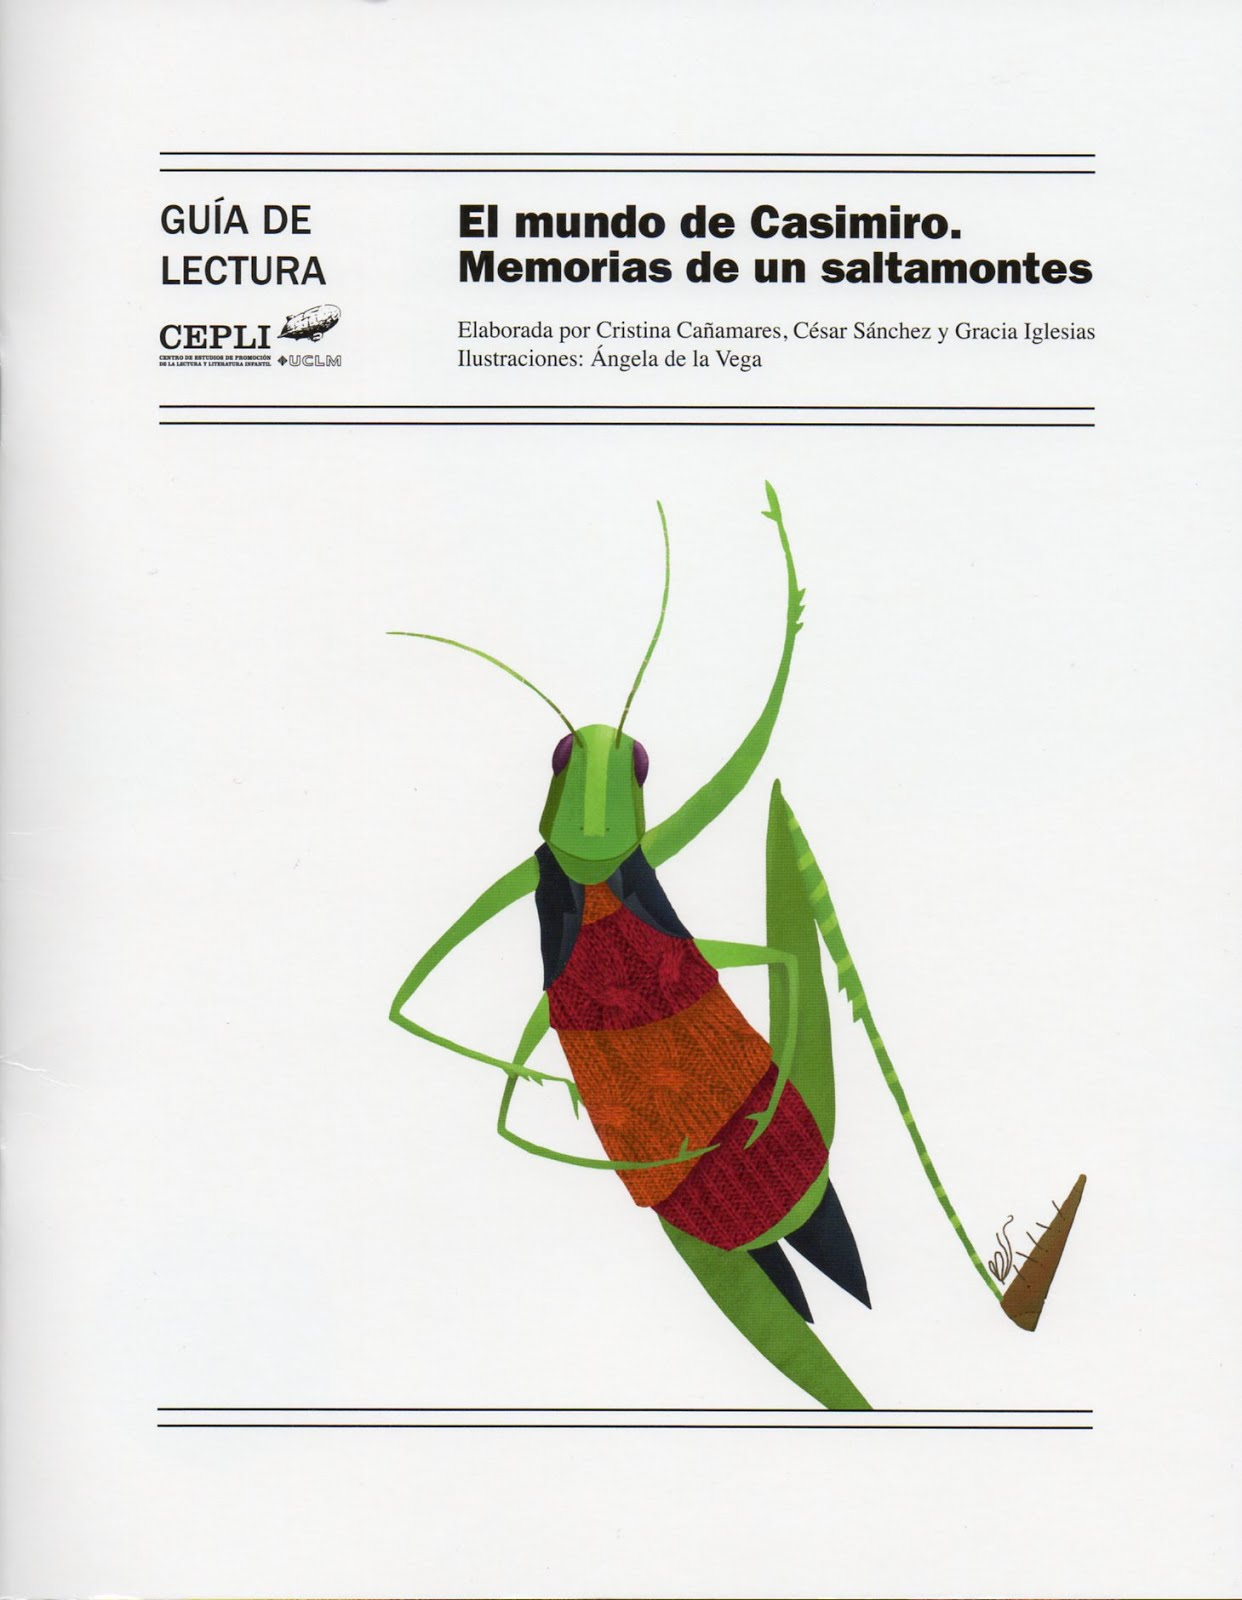 GUIA DE LECTURA "El mundo de Casimiro"